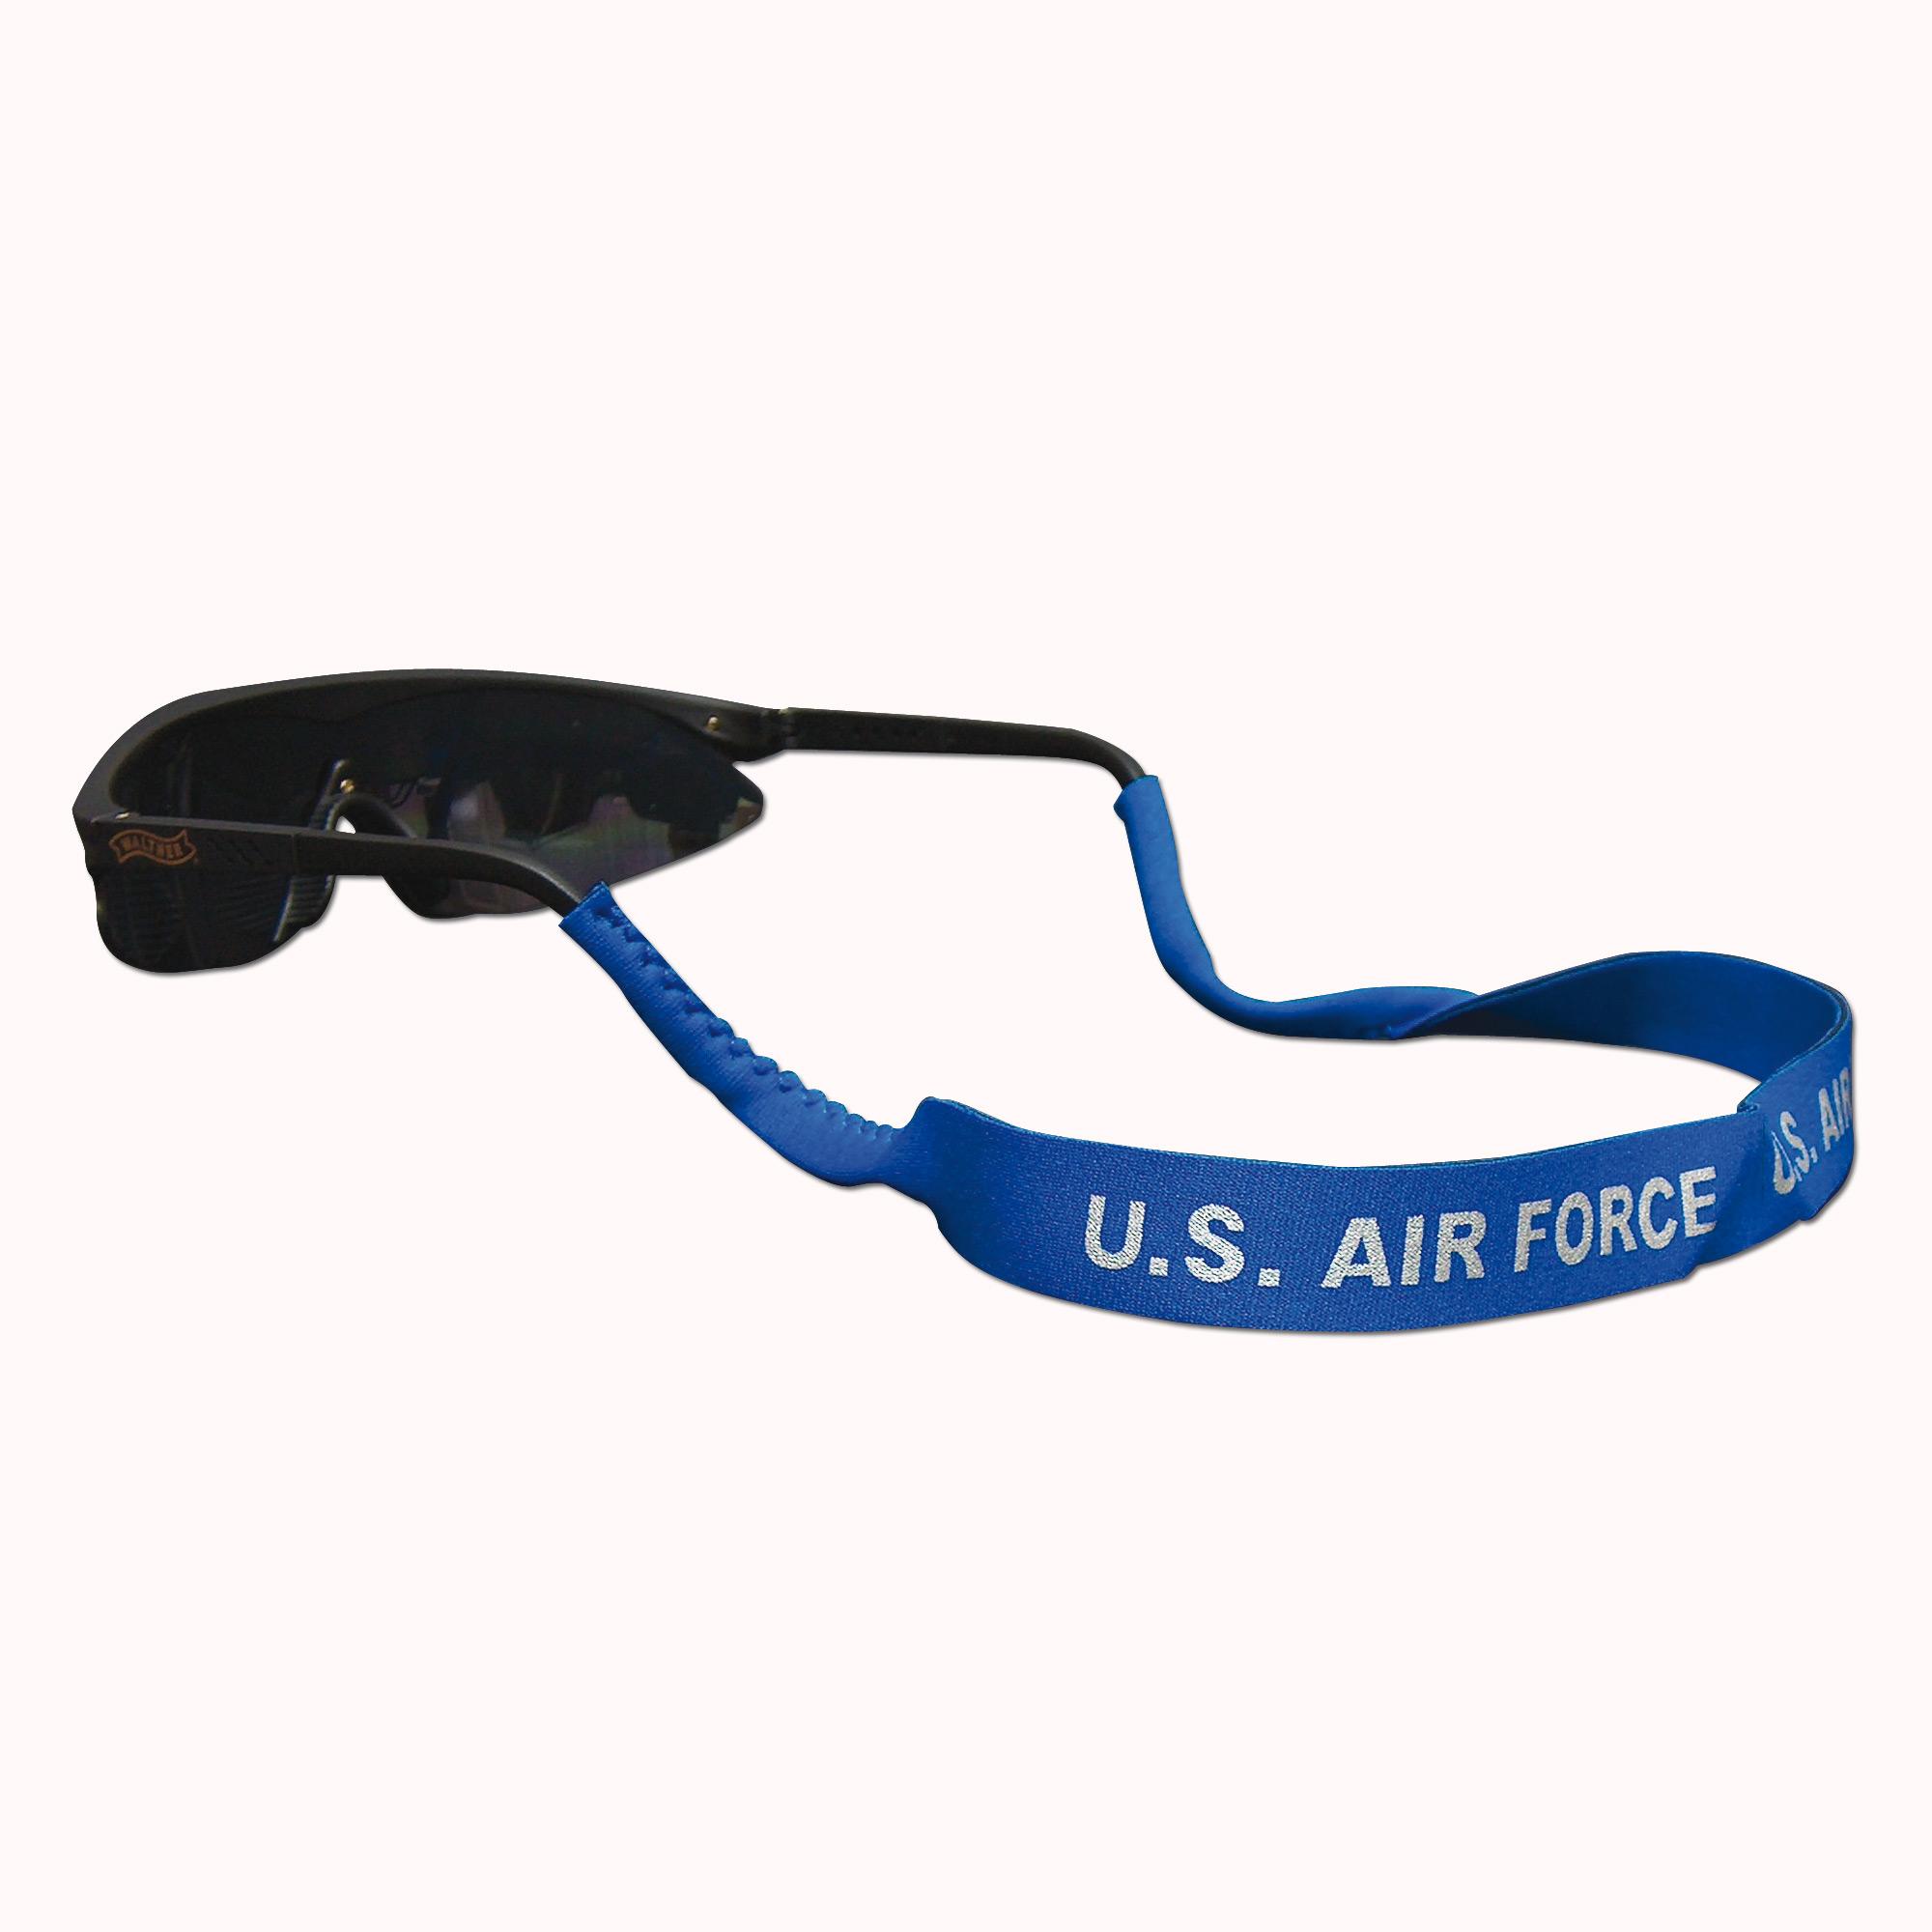 Brillenhalter U.S. Air Force